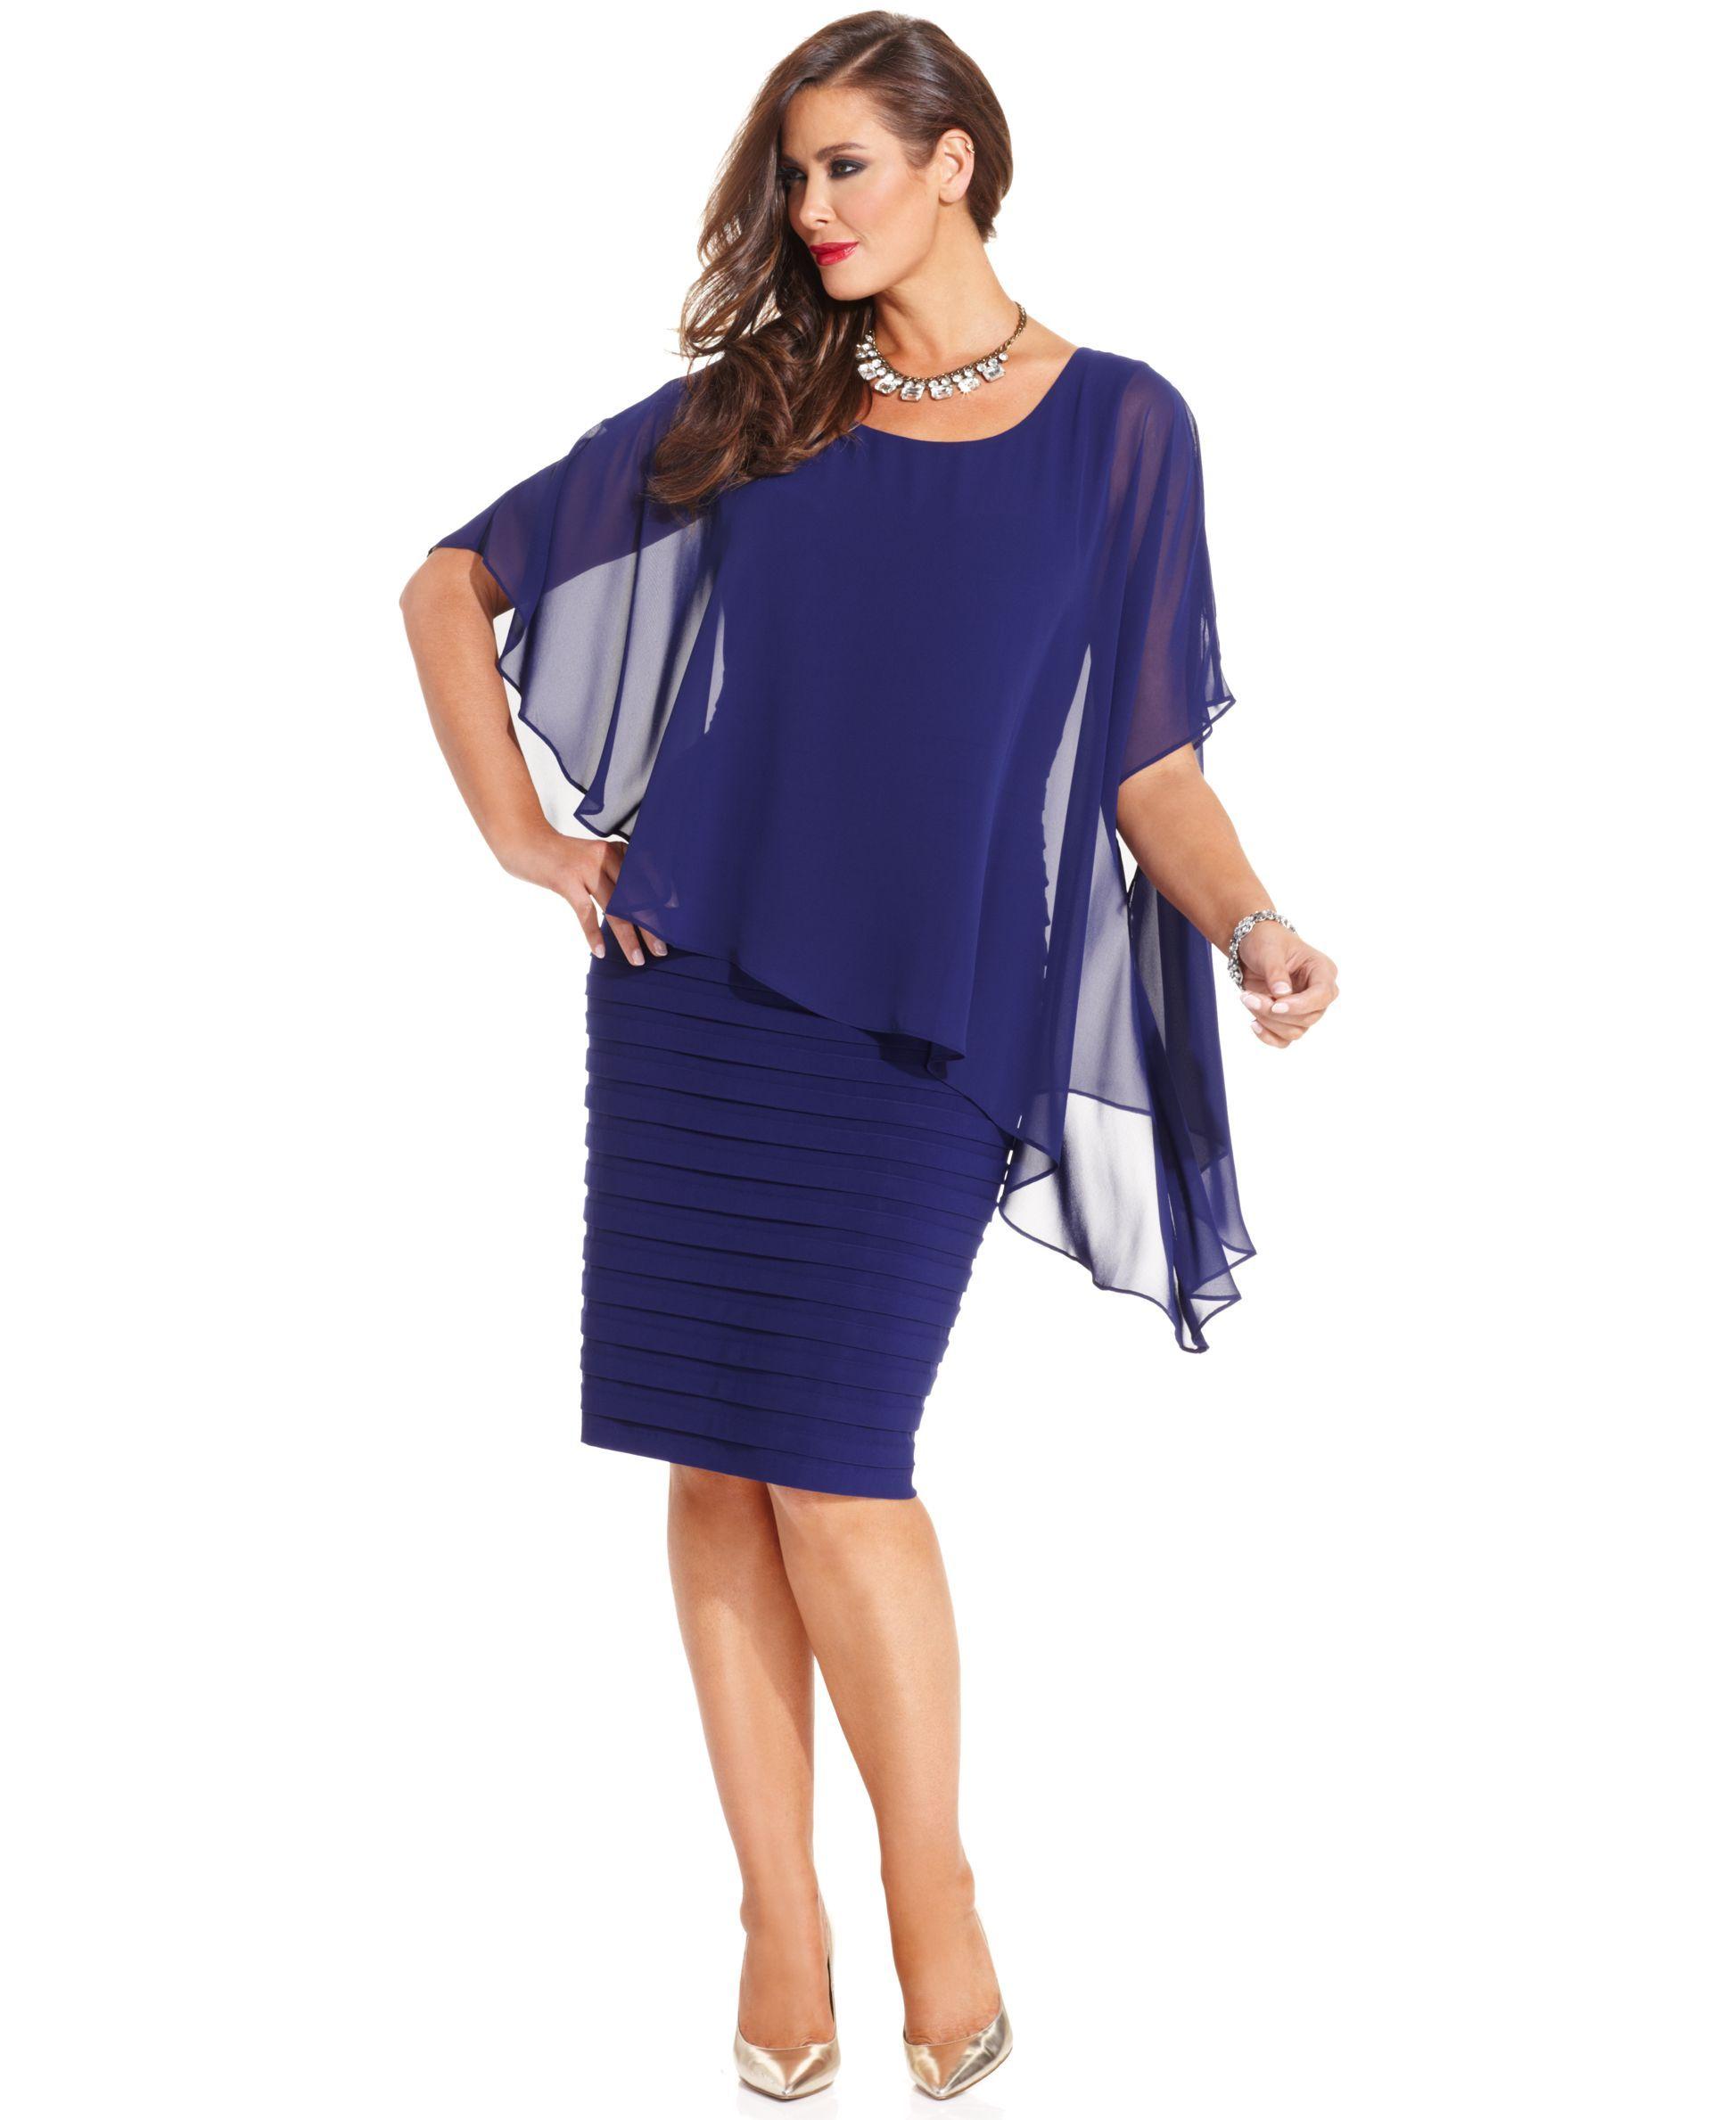 cb0d01d5 Betsy & Adam Plus Size Dress, Three-Quarter-Sleeve Chiffon Capelet Sheath -  Plus Size Dresses - Plus Sizes - Macy's